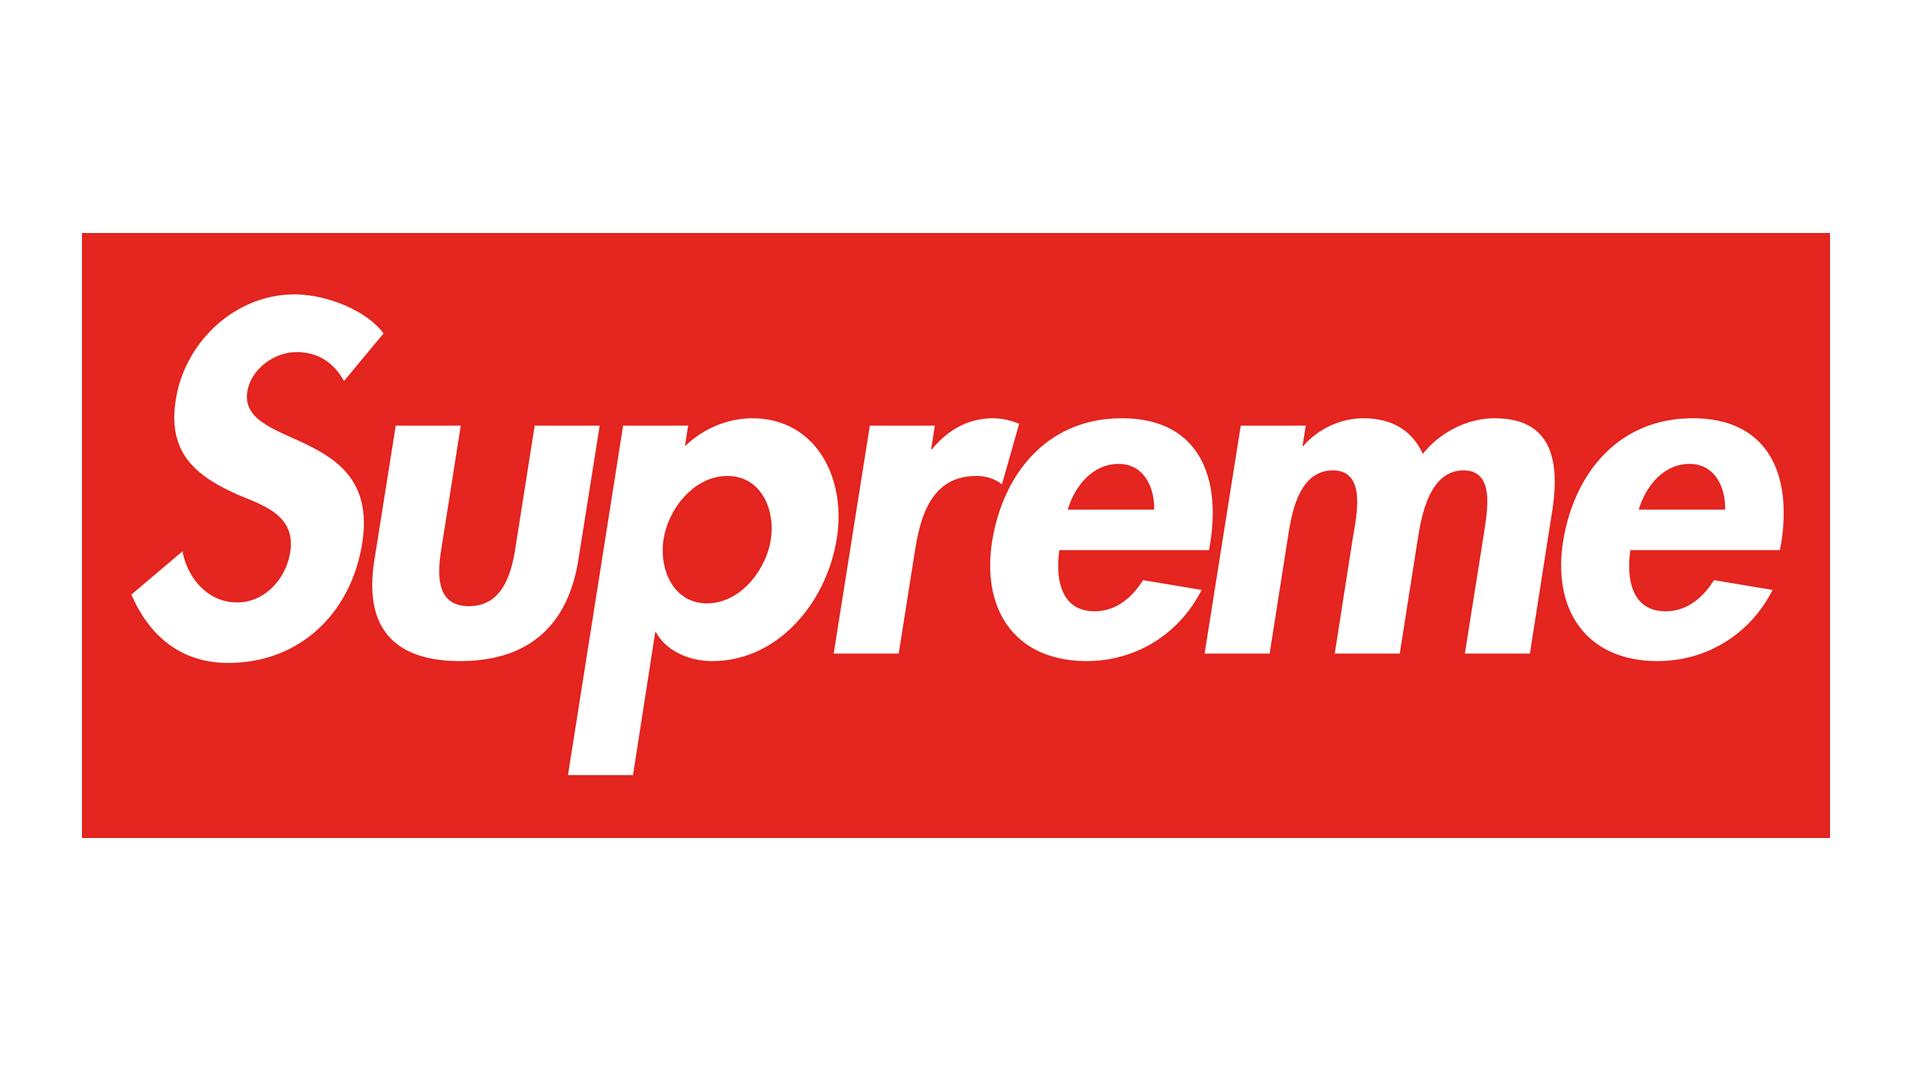 Supreme in 2019.